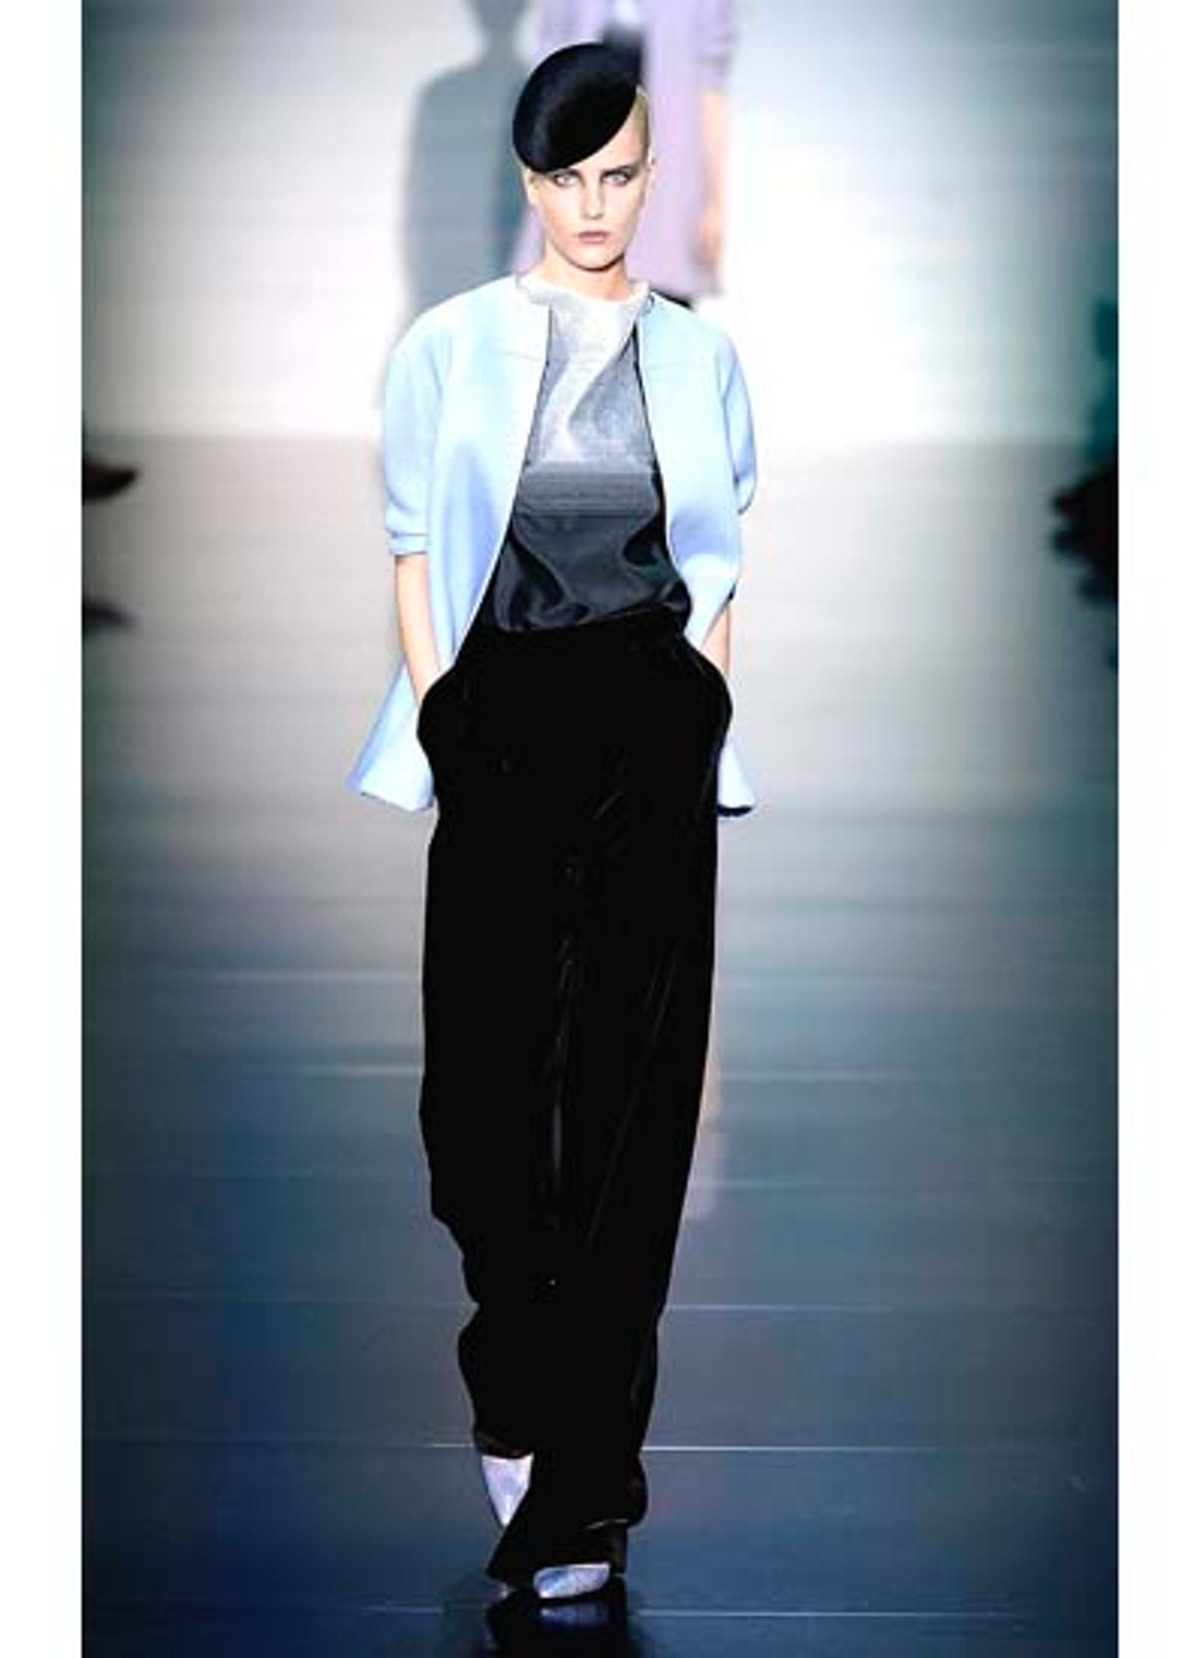 fass-giorgio-armani-couture-2012-runway-02-v.jpg